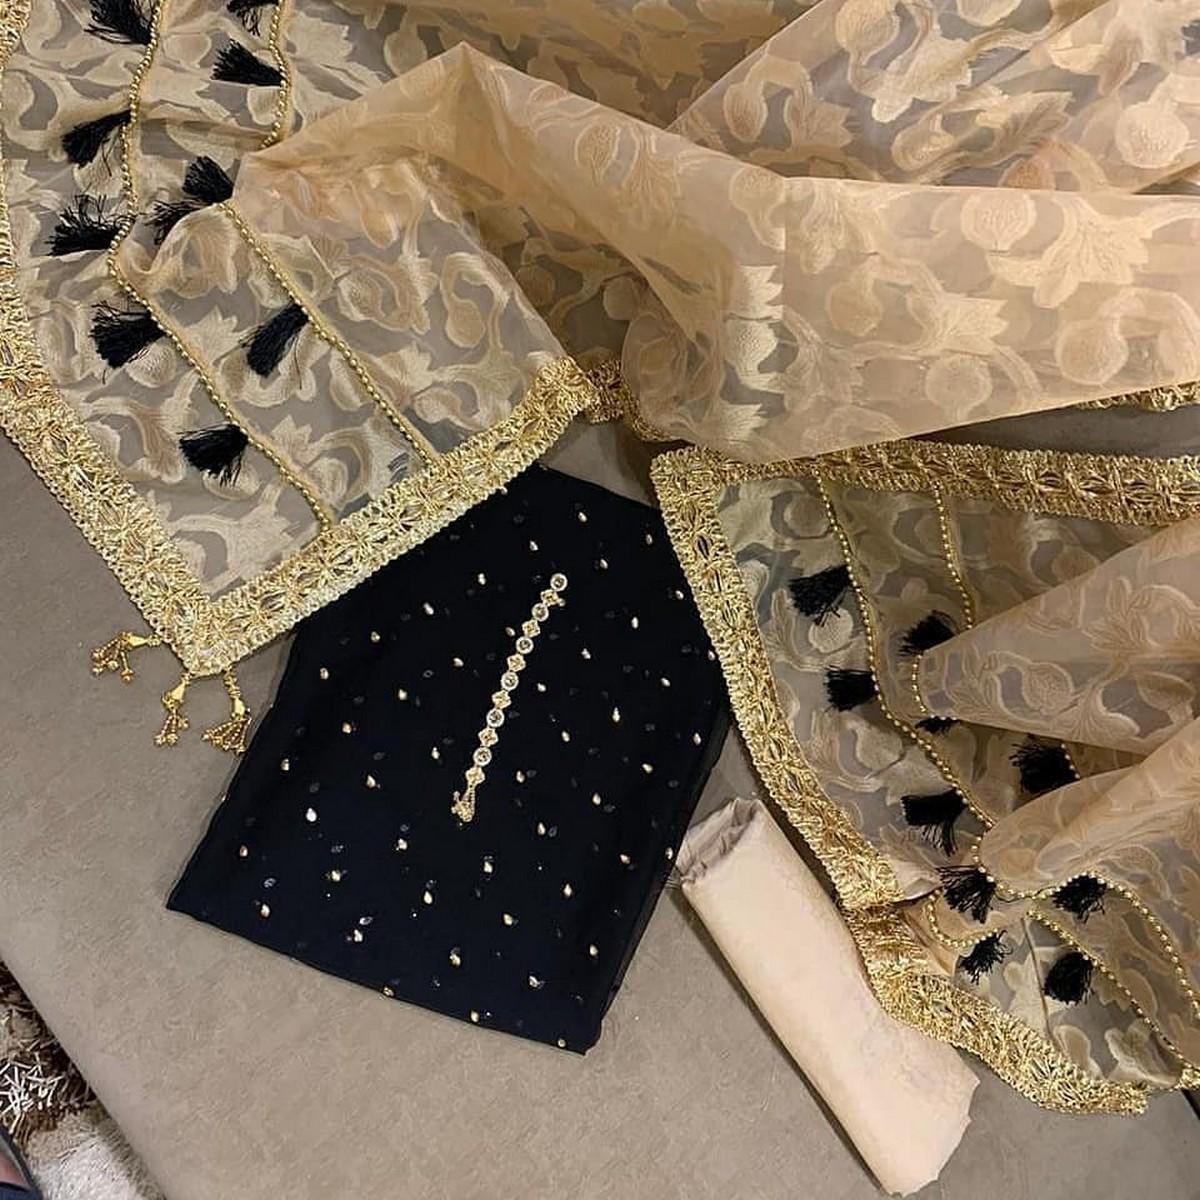 sastaae Organza Jacquard 3 Pcs Un-stitched Suit With Chiffon Handwork Stone Shirt & Maysori Trouser - Black